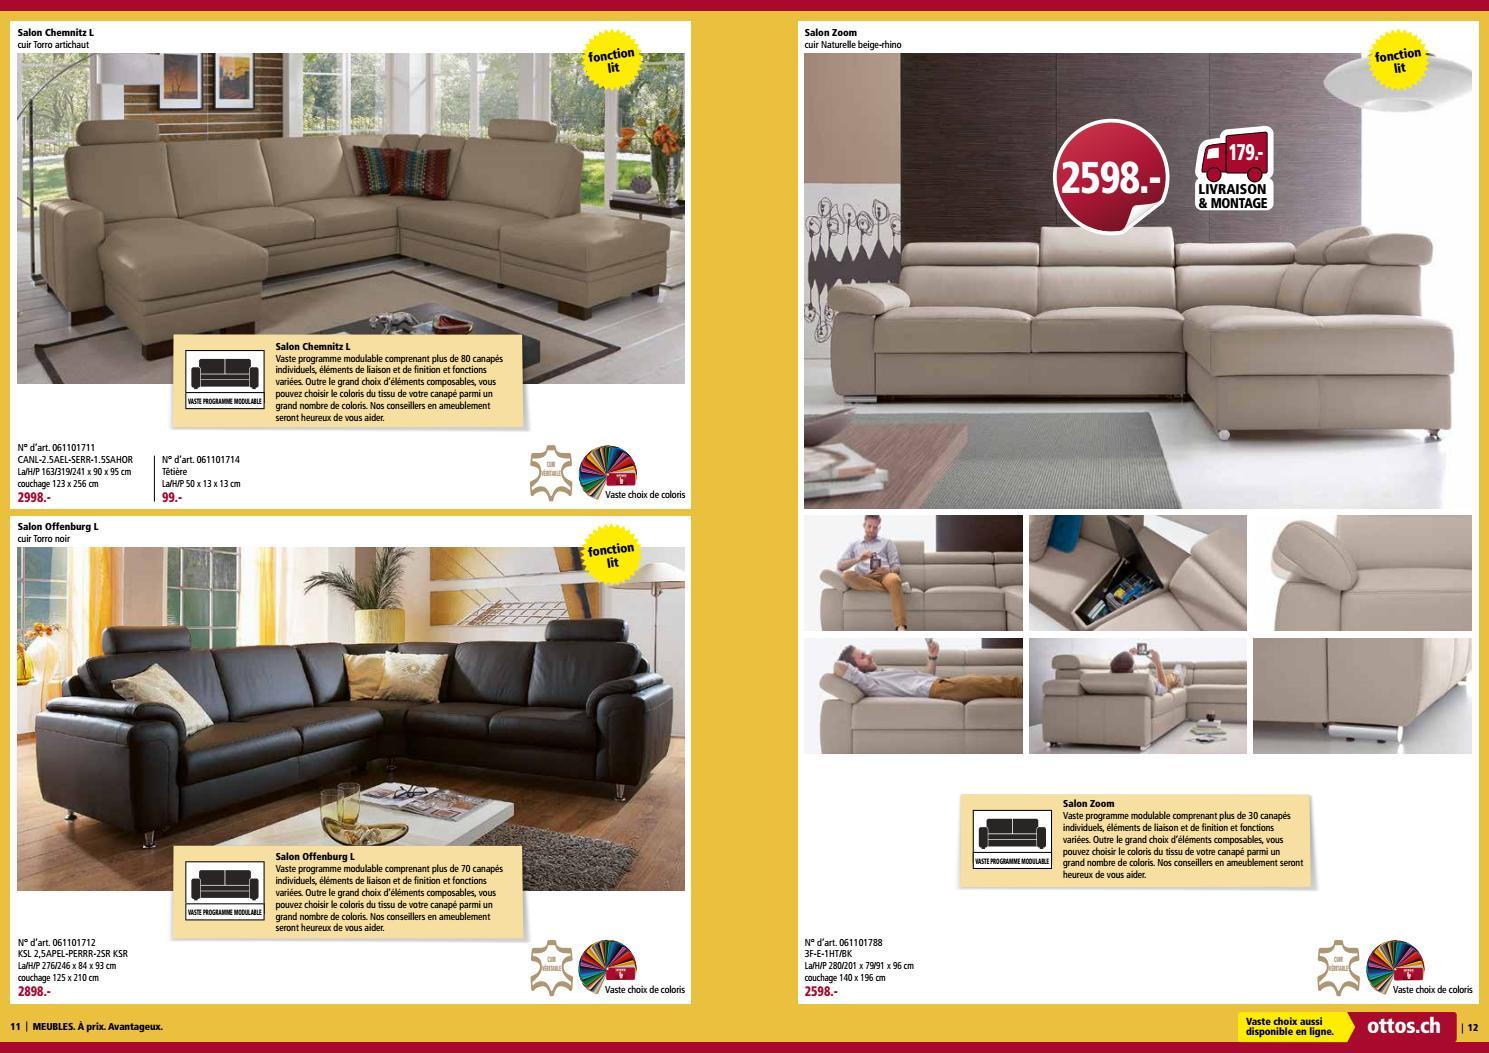 magasin de meuble offenburg magasin de meuble offenburg comment planter du basilic magasin. Black Bedroom Furniture Sets. Home Design Ideas